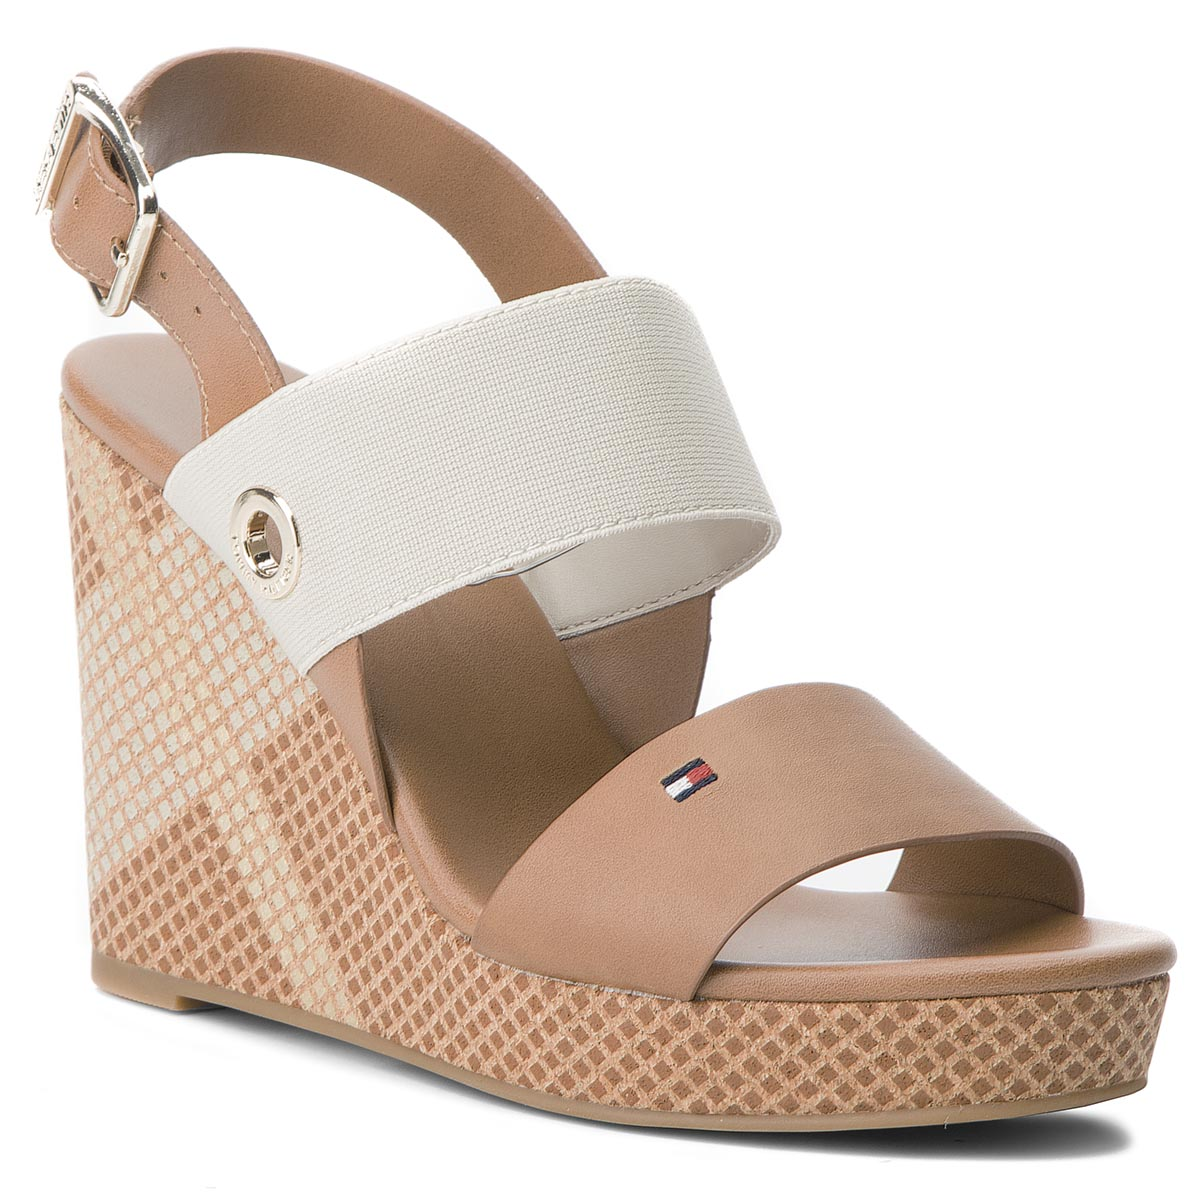 38884f6e329bb Sandals TOMMY HILFIGER Feminine High Hedge FW0FW03354 Summer Cognac 929